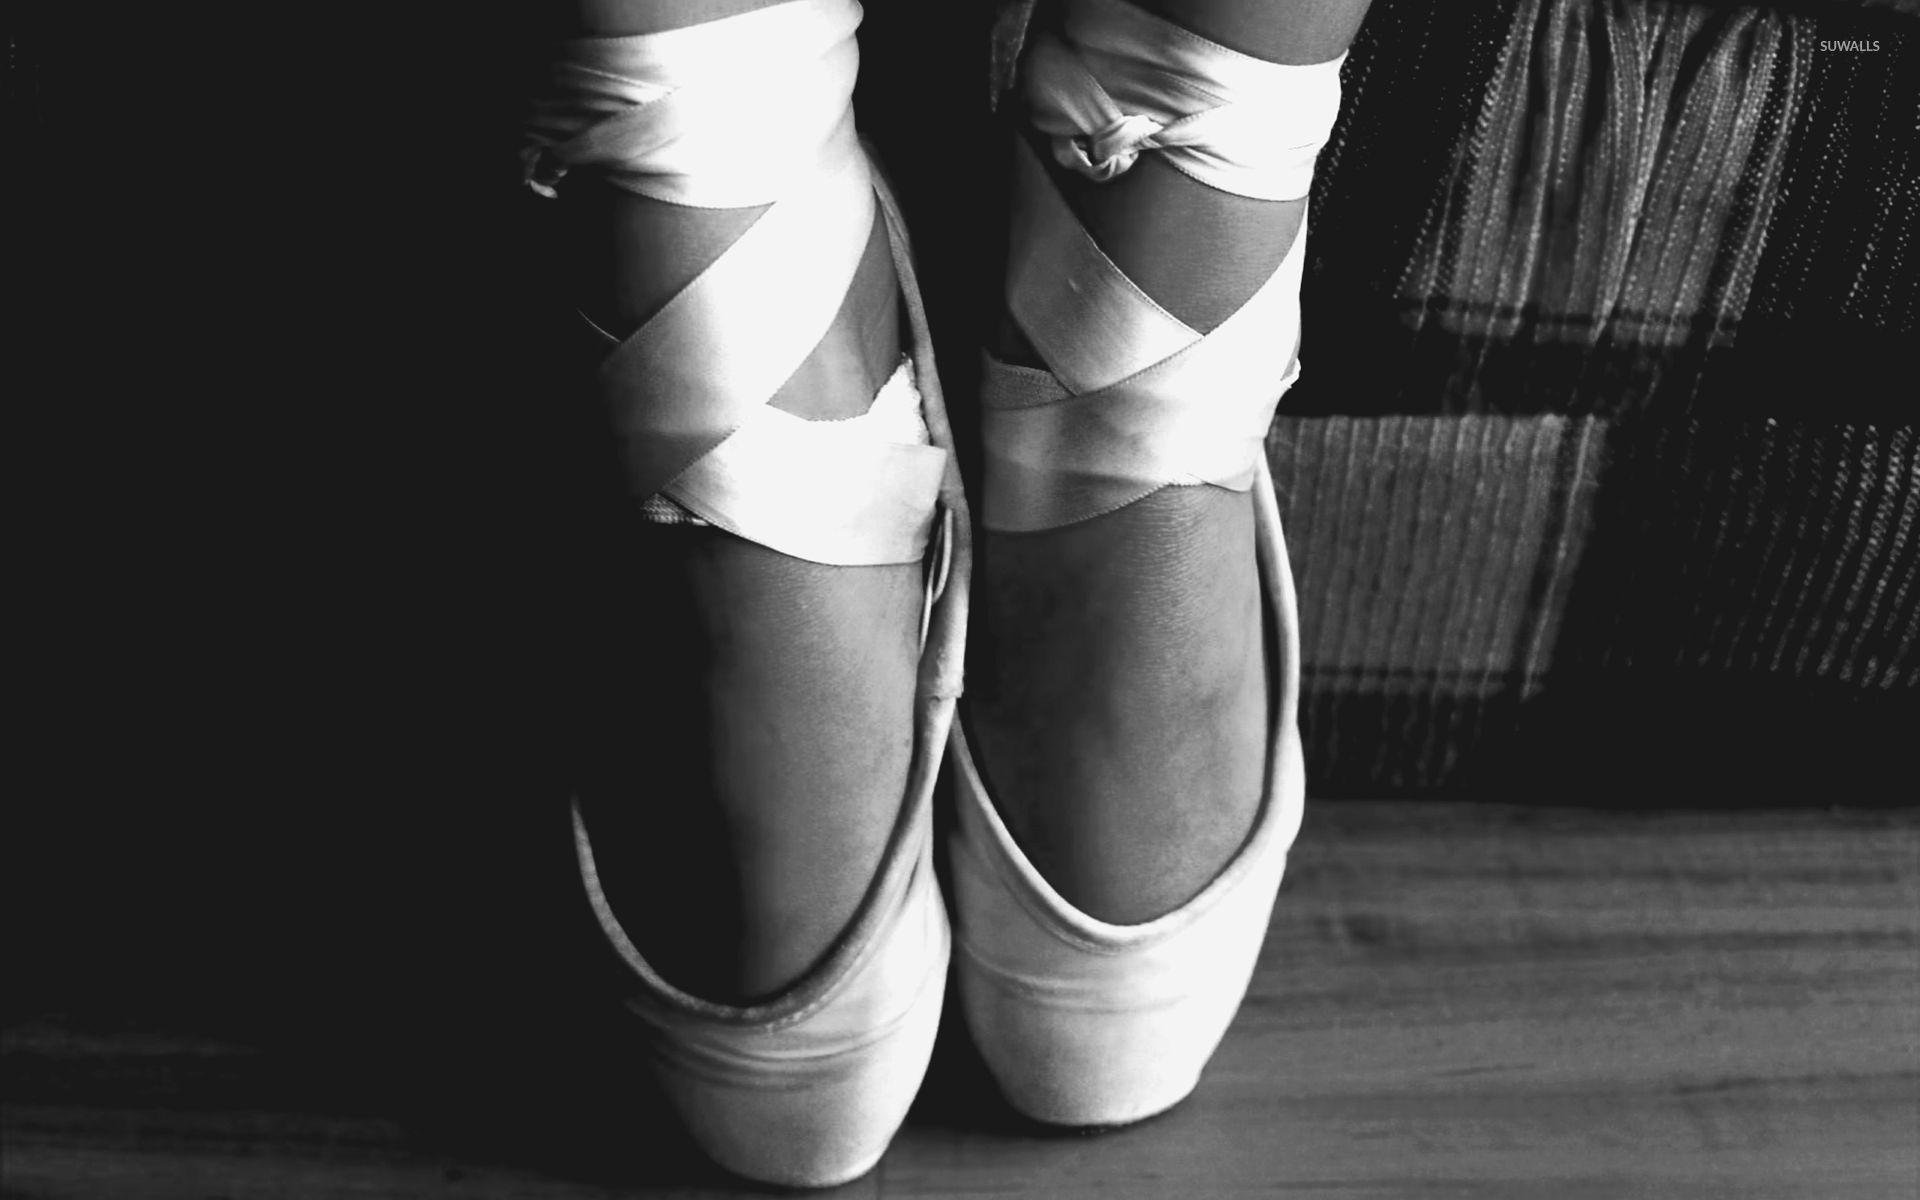 Ballet Shoes 2 Wallpaper